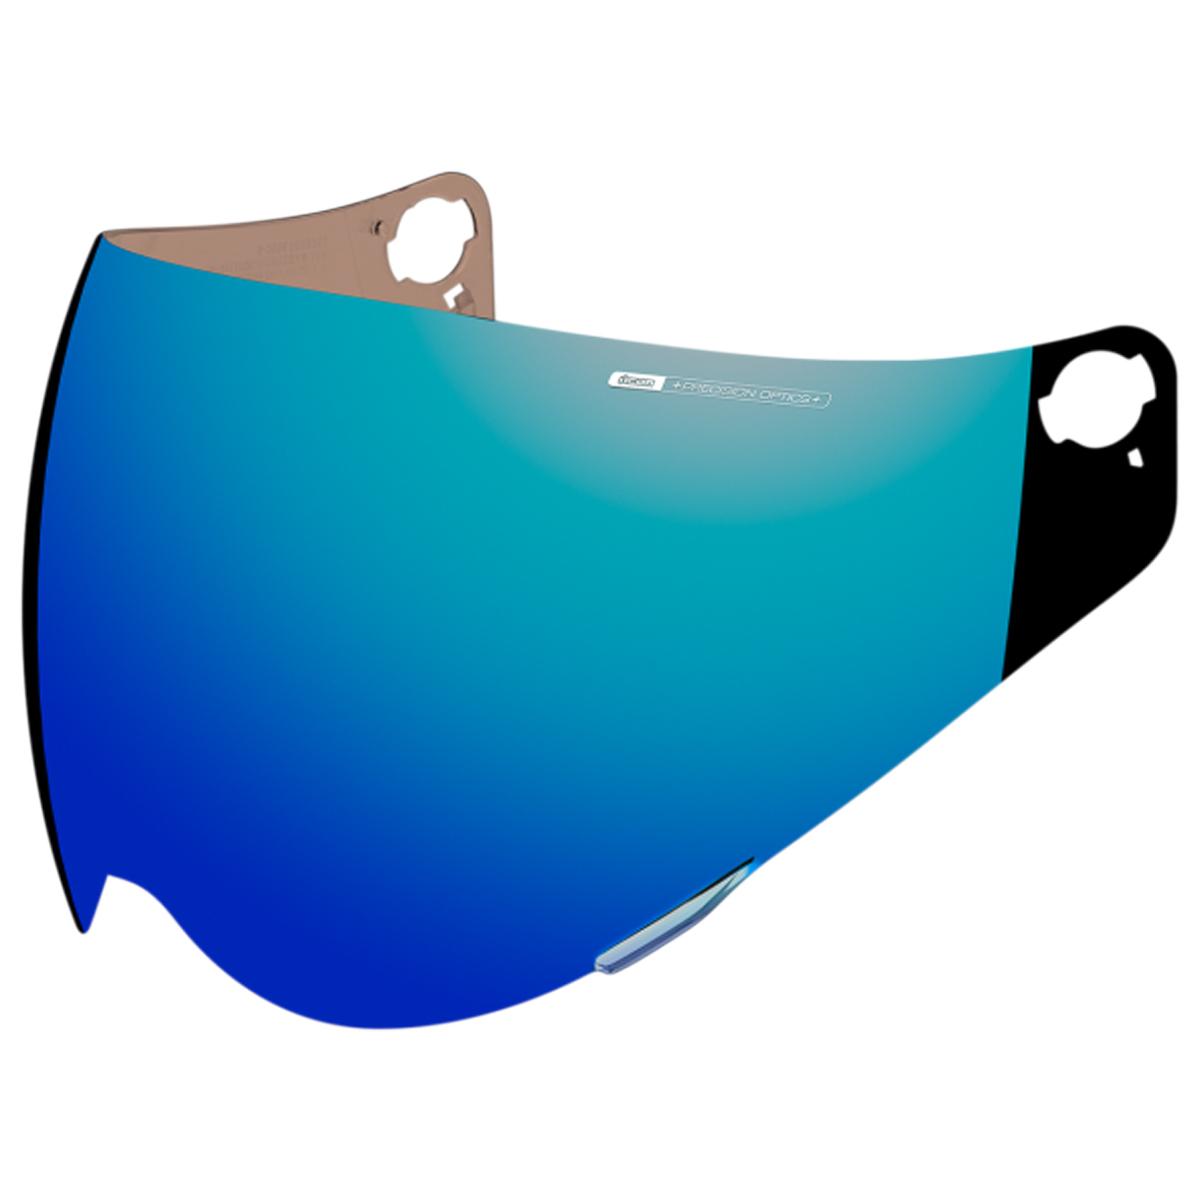 Icon Variant Helmet Face Shields.